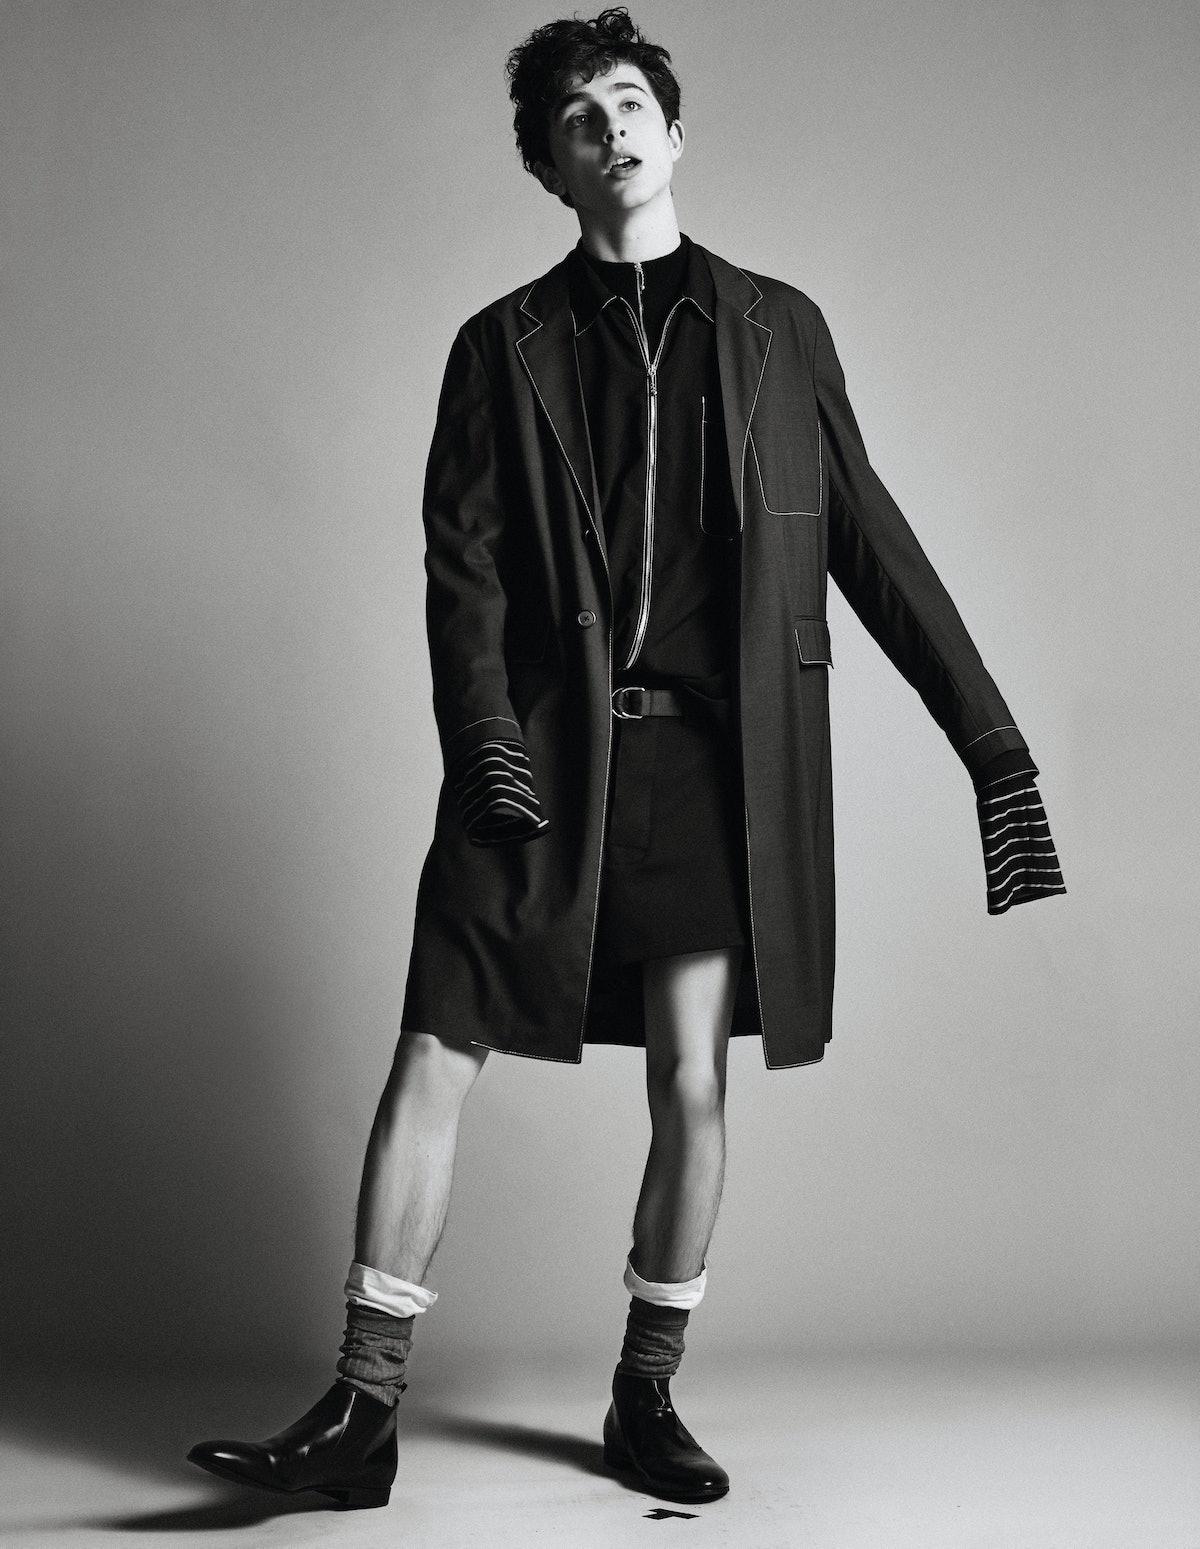 Timothée Chalamet in shorts.